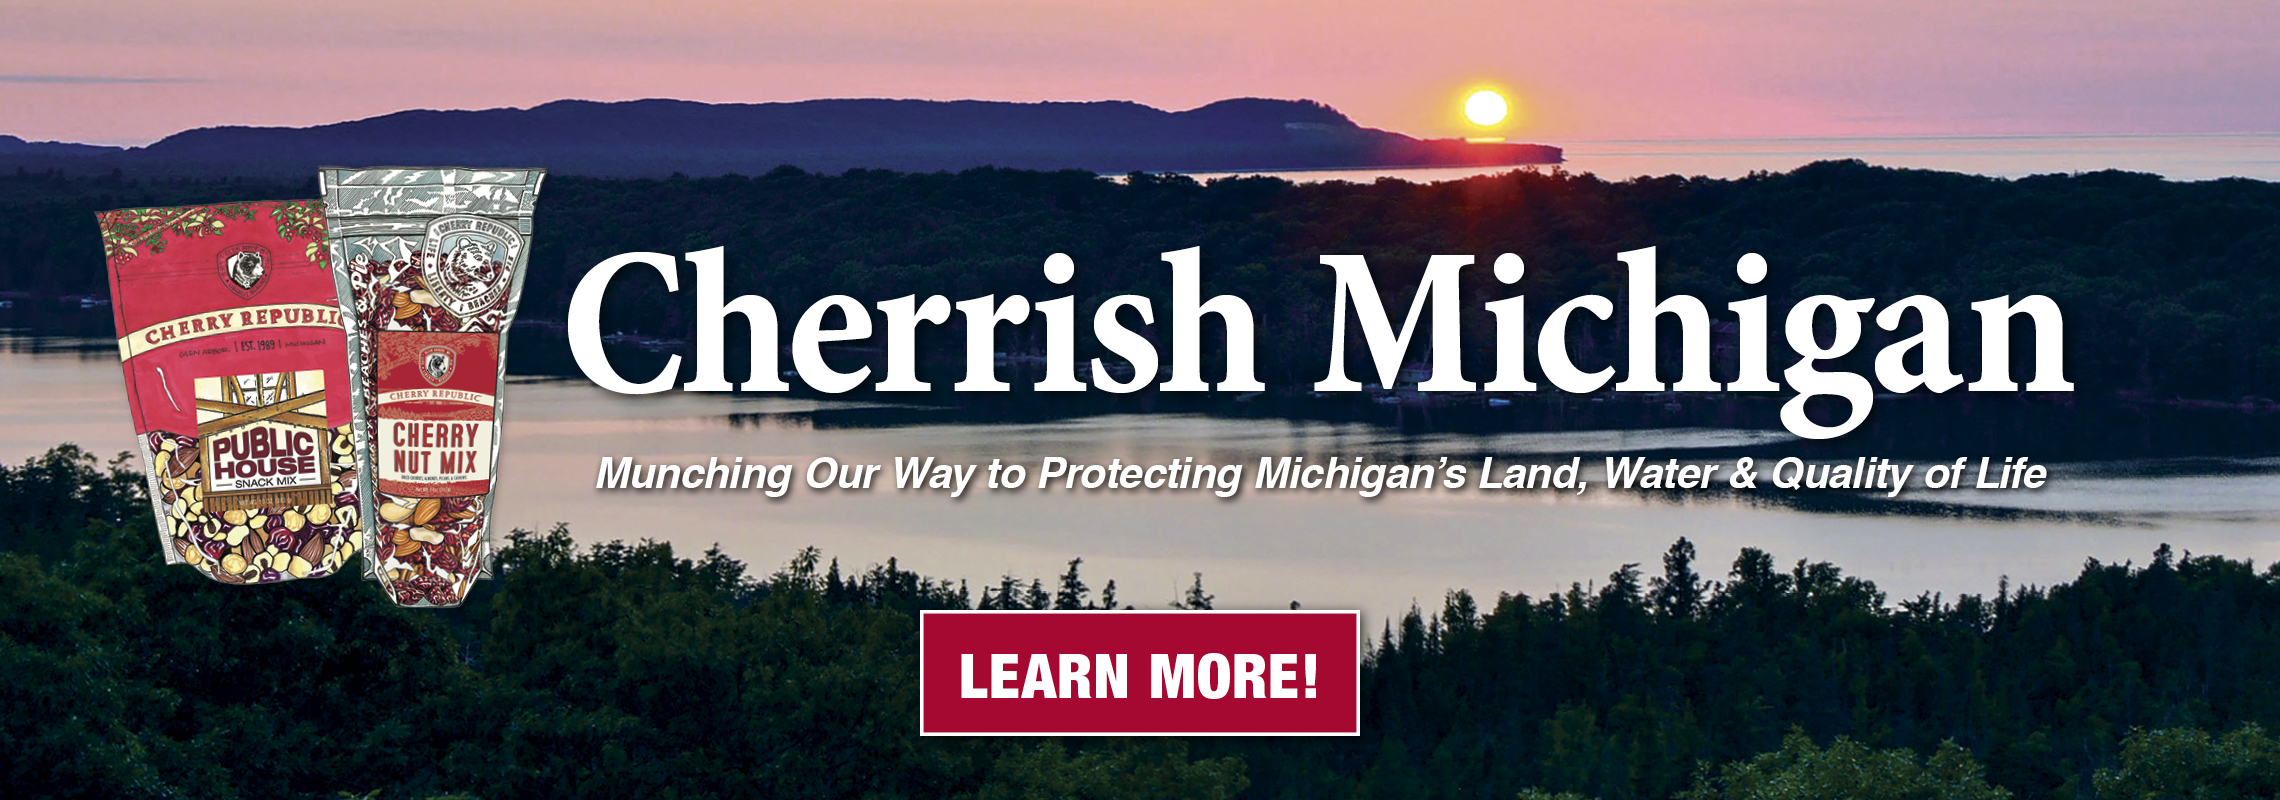 Cherrish Michigan